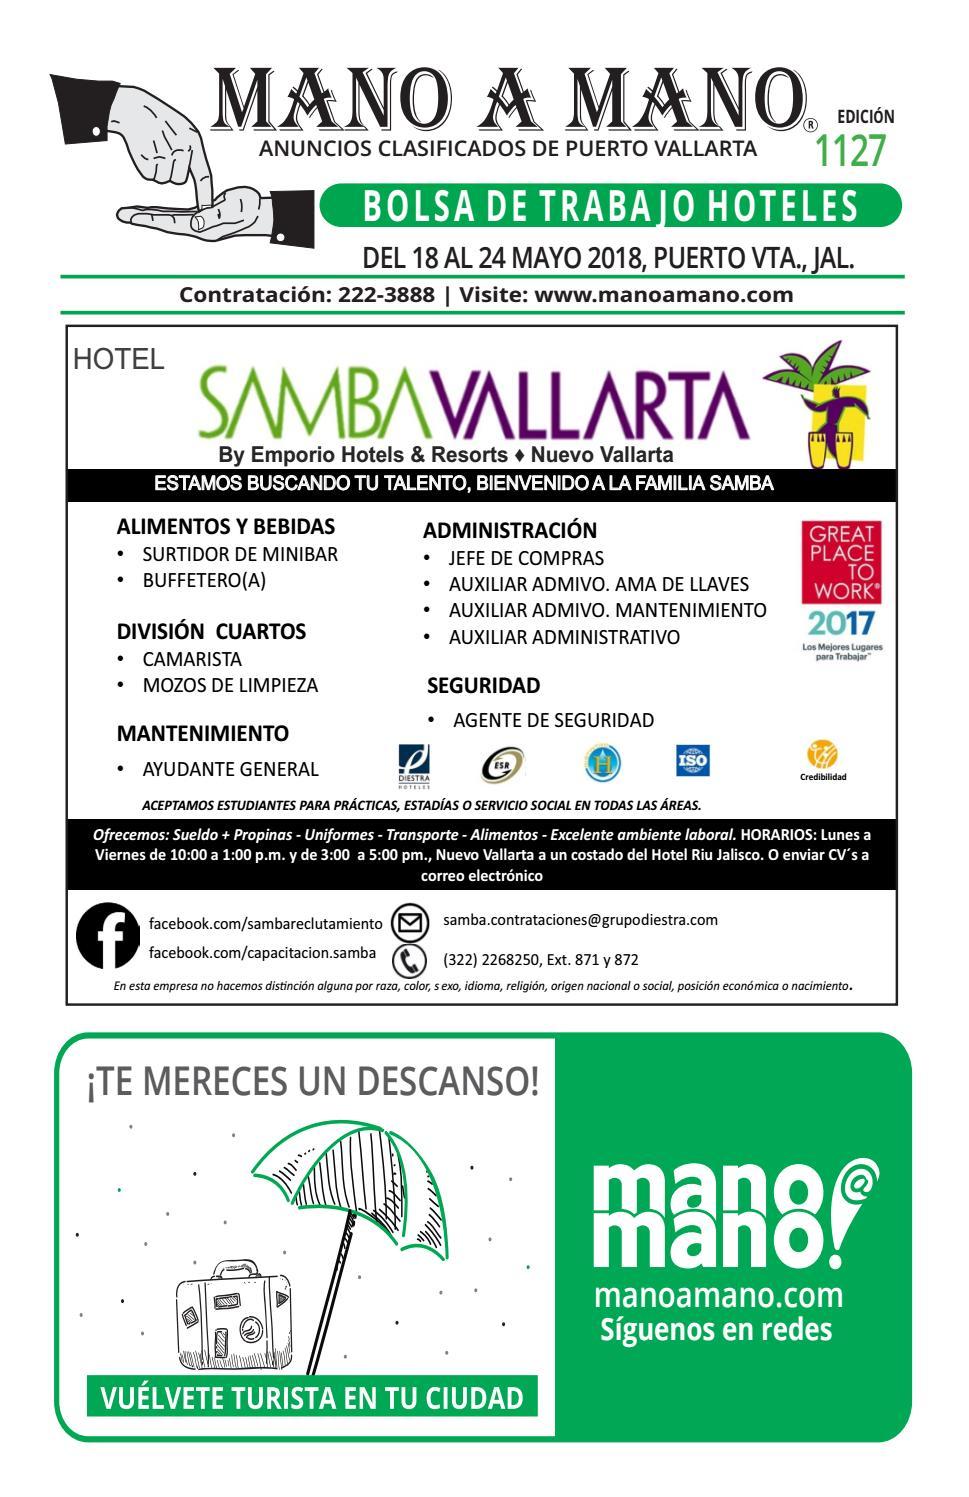 Excepcional Curriculum Vitae Para El Supervisor De Limpieza Del ...